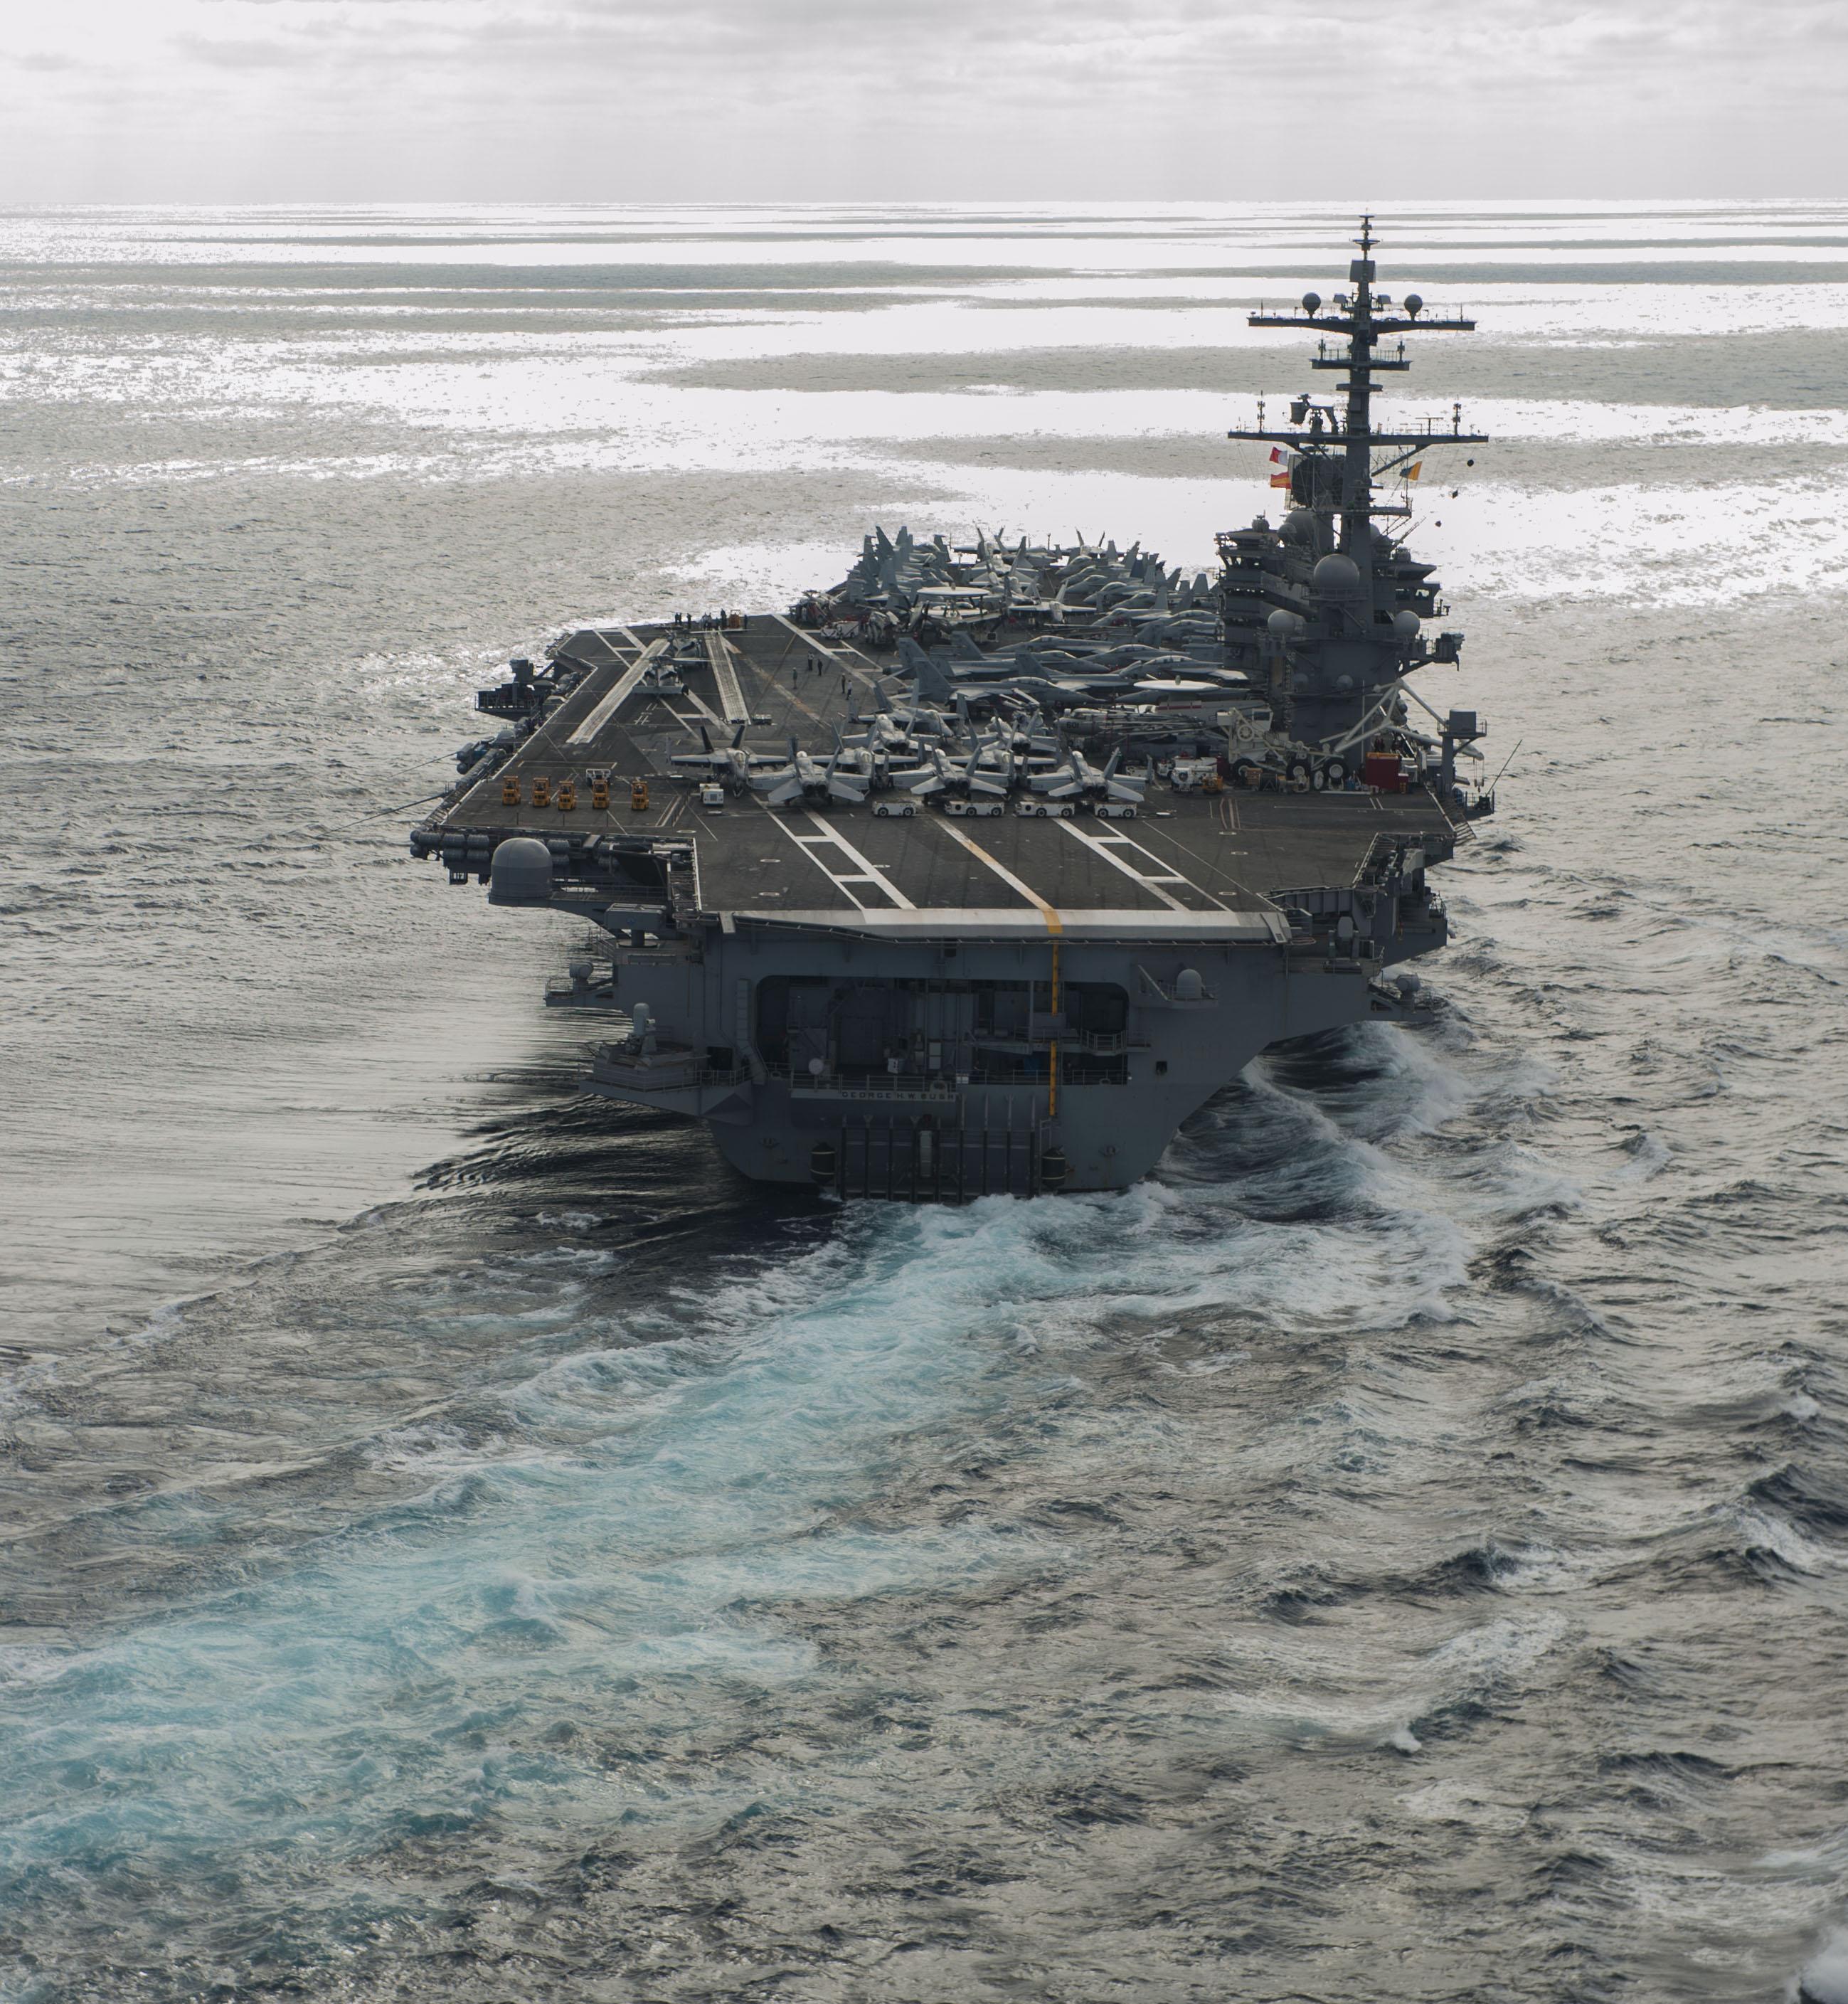 USS George H.W. Bush (CVN-77) sails through the Atlantic Ocean on Dec. 6, 2016. US Navy Photo